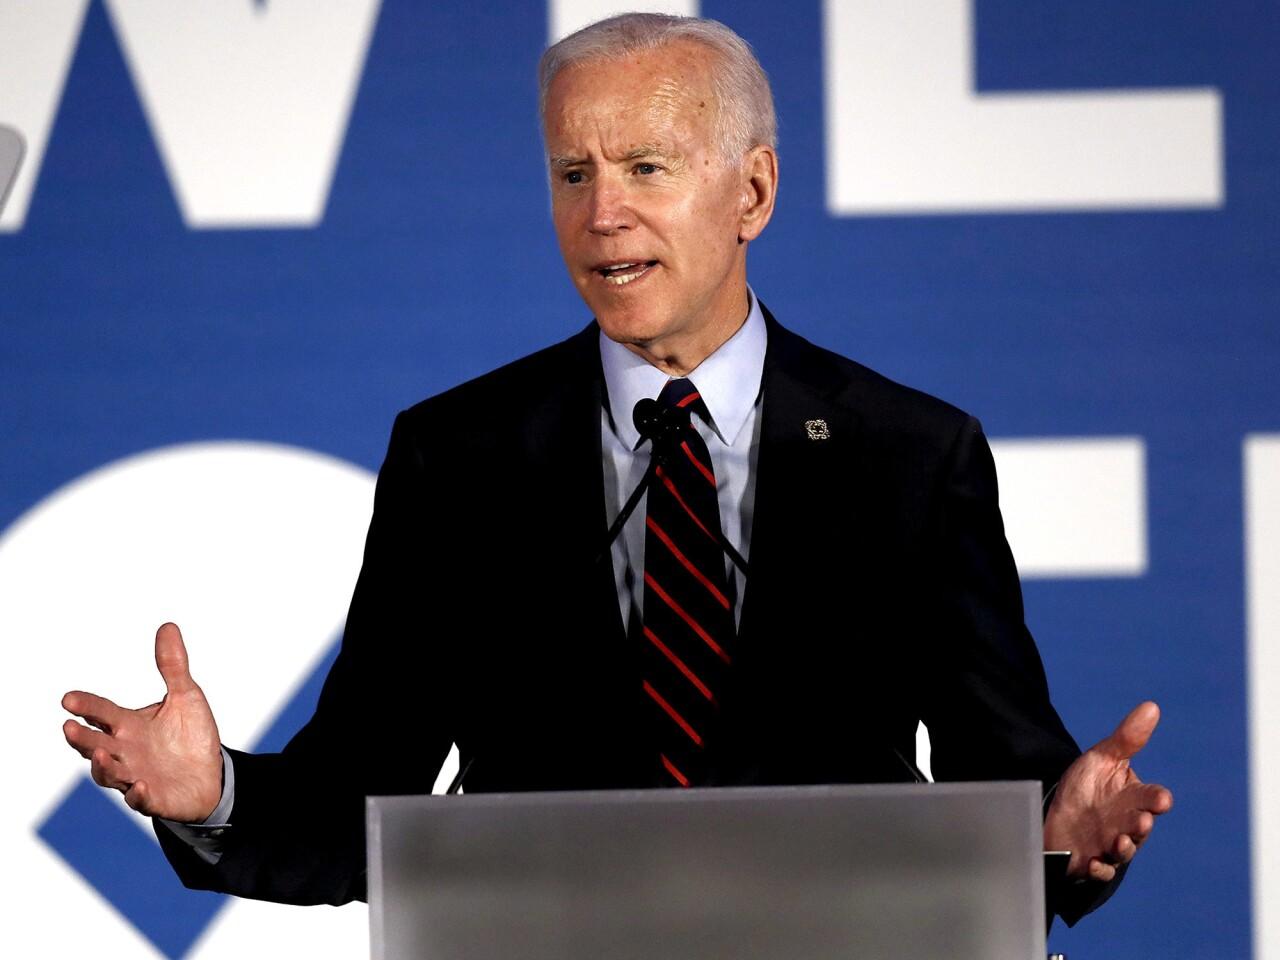 Former Vice President Joe Biden of Delaware